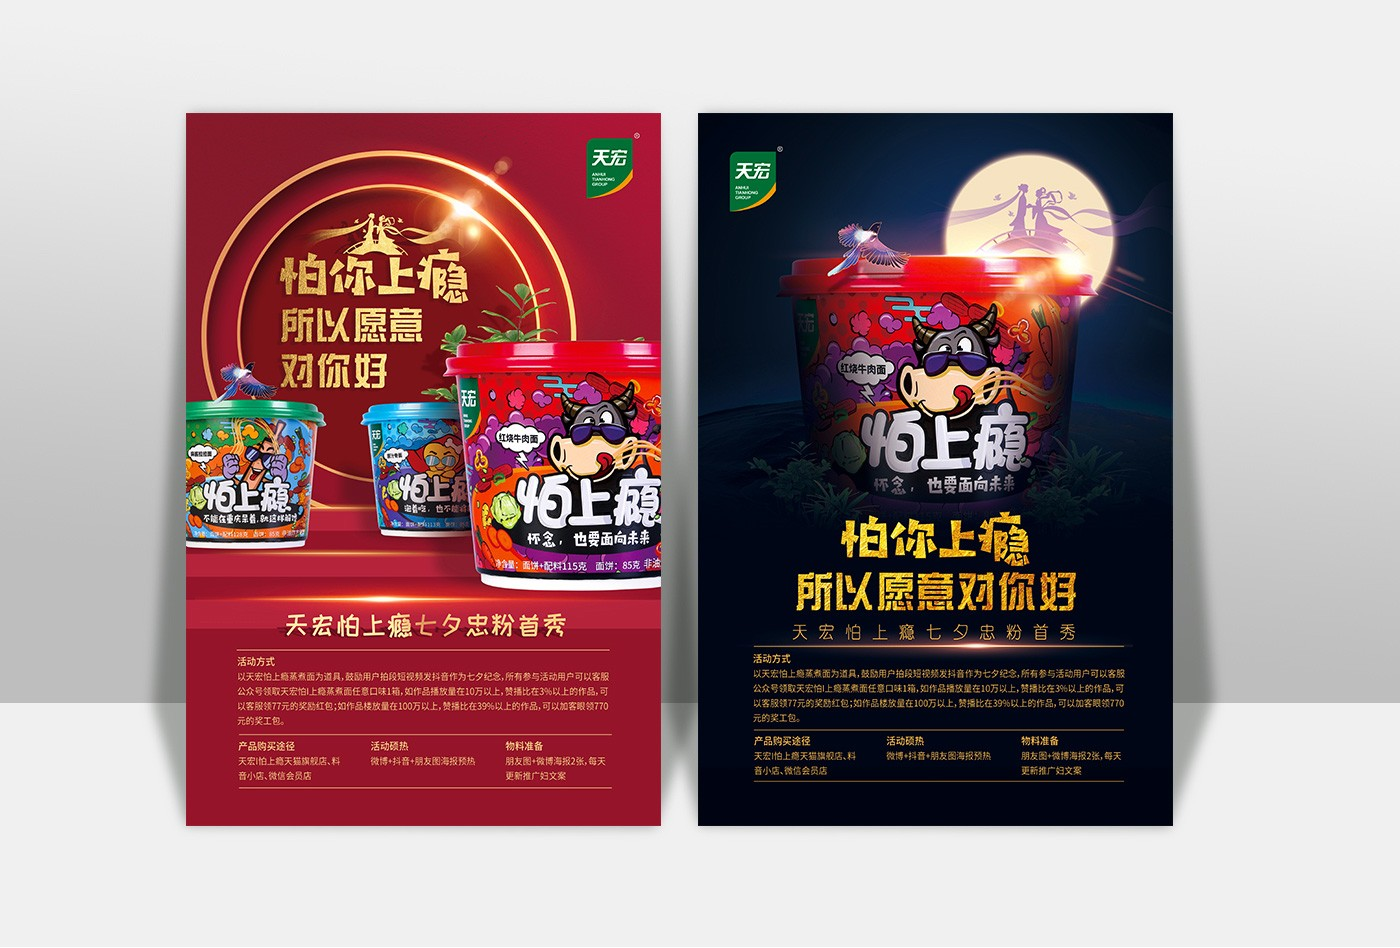 天宏怕上癮方便面品牌<a href='http://www.6bubu.com/service/baozhuangsheji/' title='' style='color:;font-weight:bold'>包裝設計</a>16.jpg